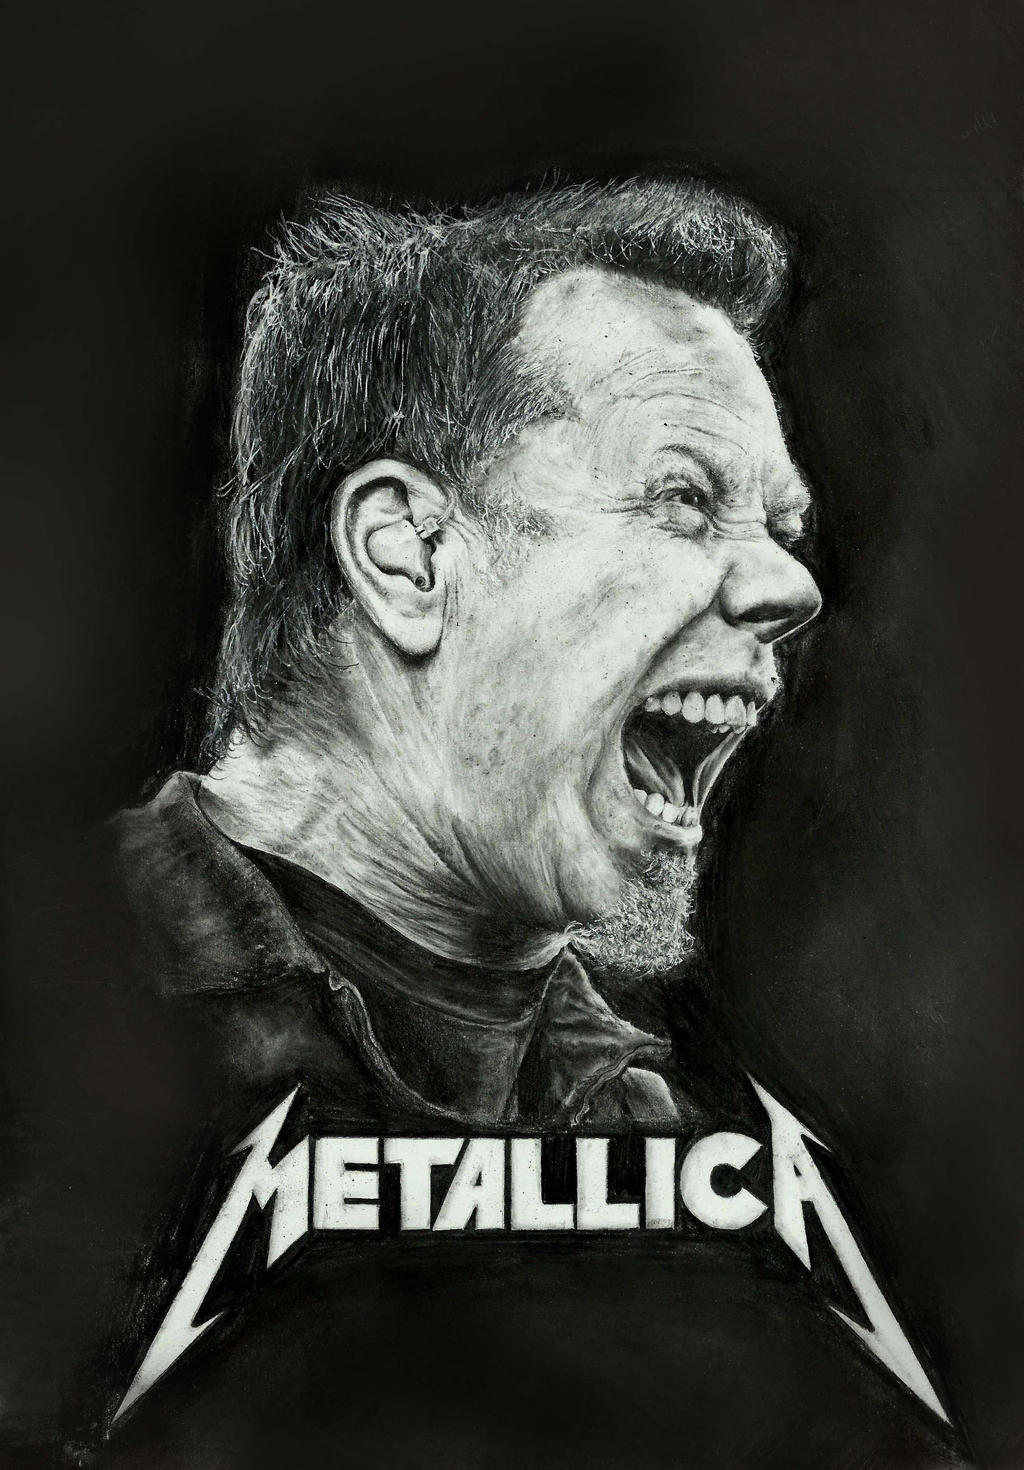 James Hetfield drawing